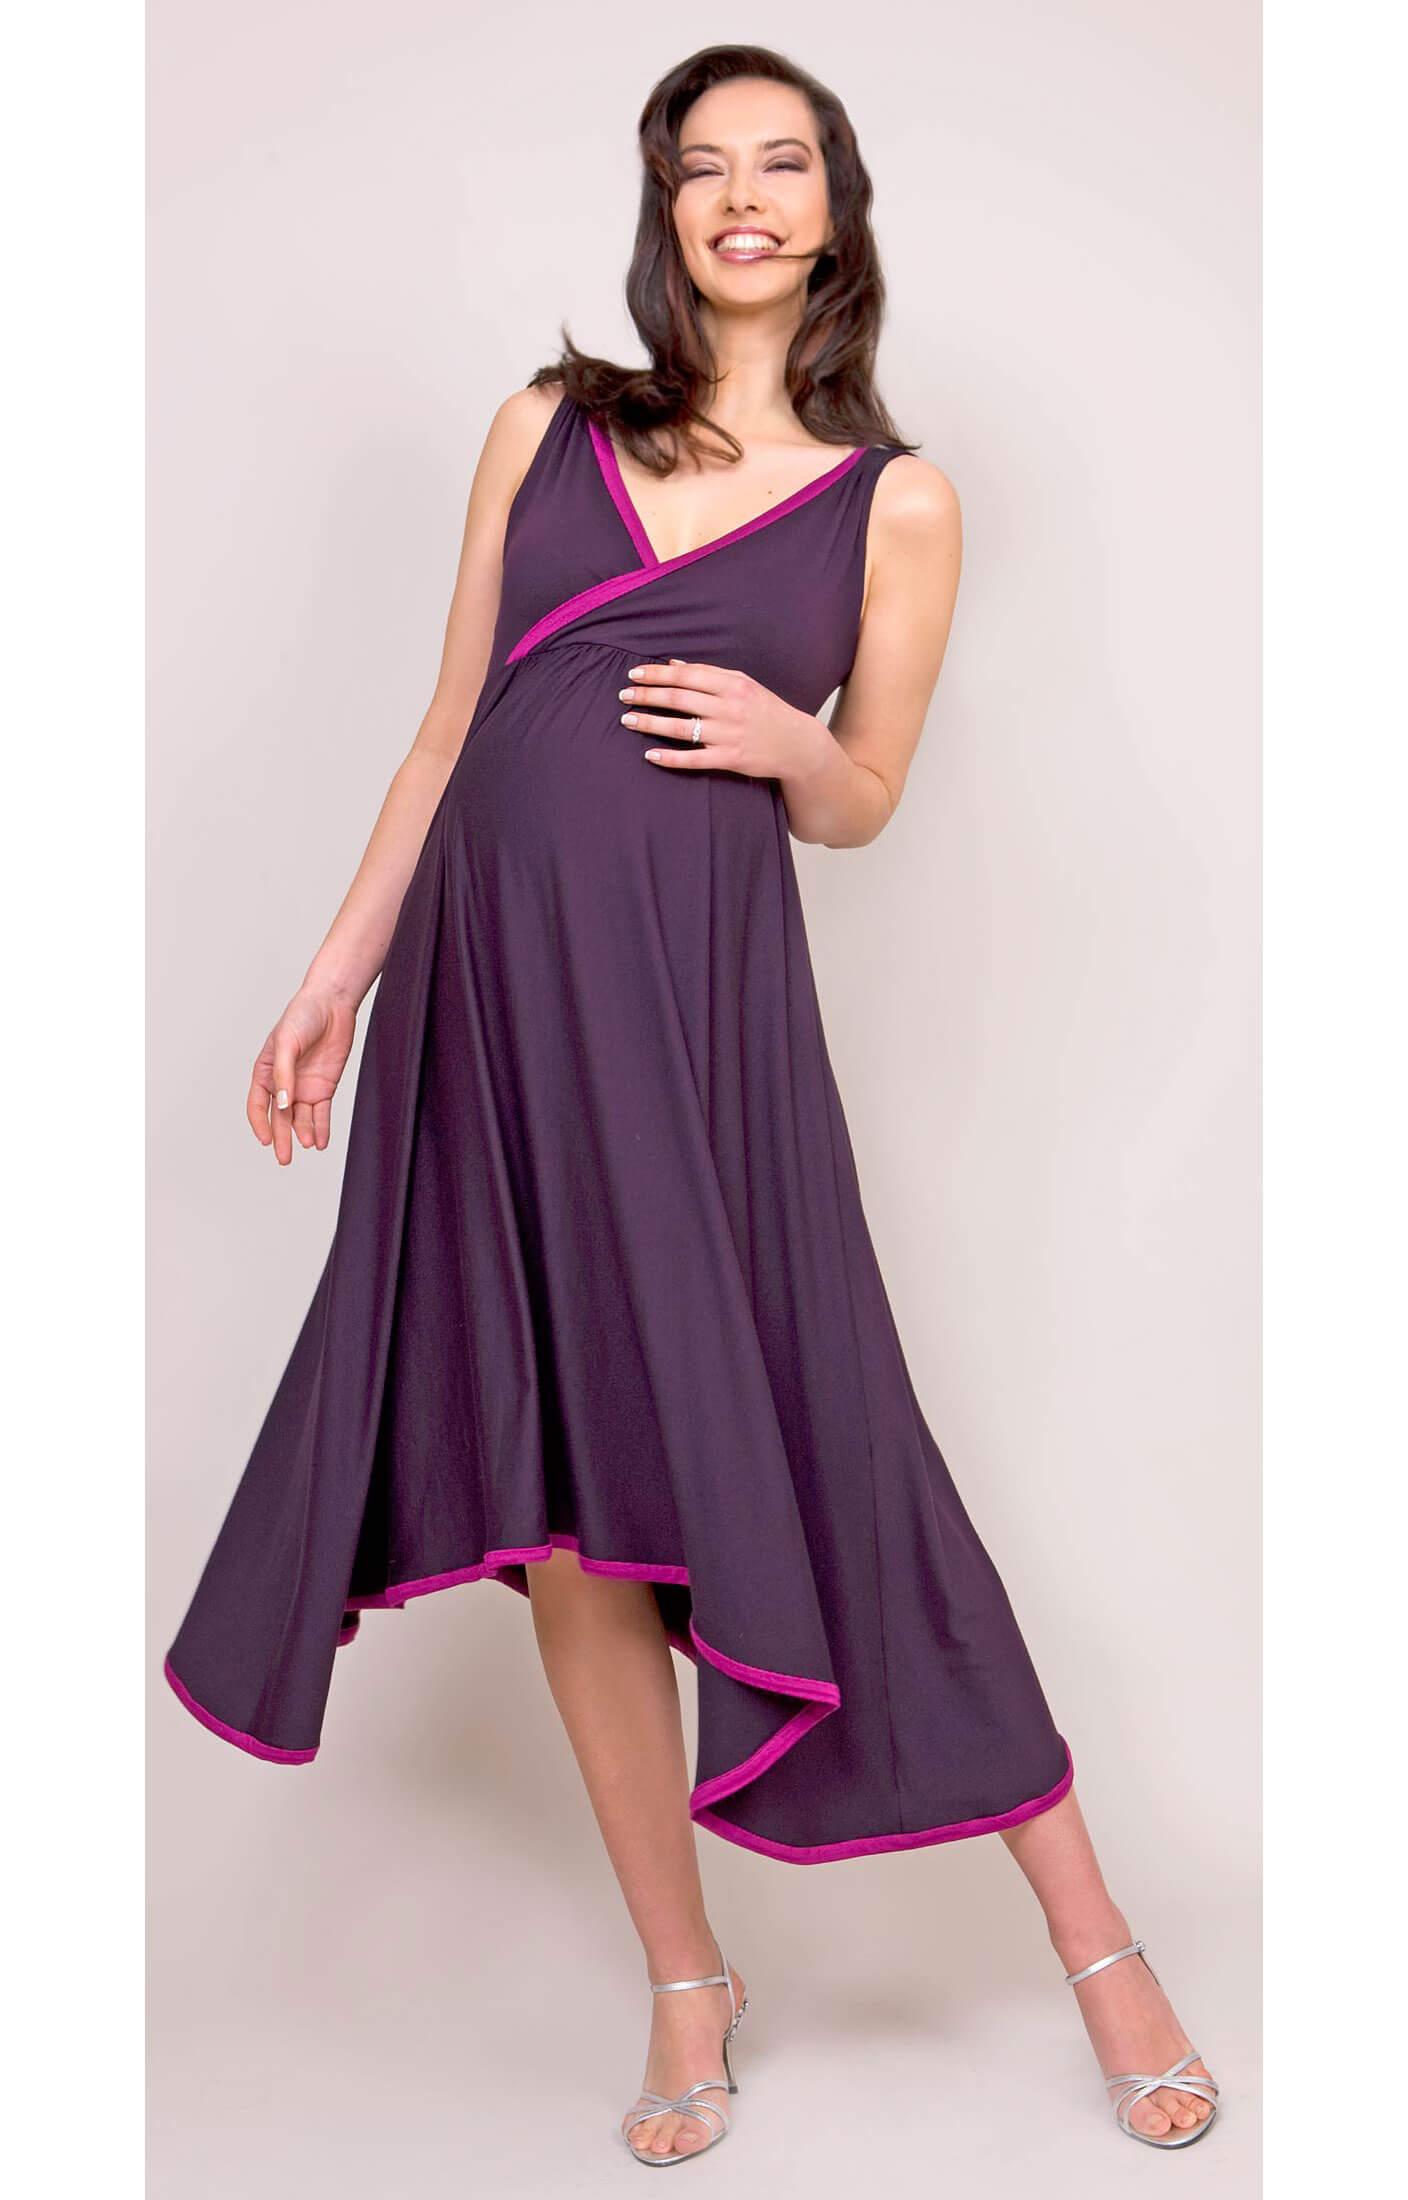 Yolanda Maternity Dress - Maternity Wedding Dresses, Evening Wear and ...